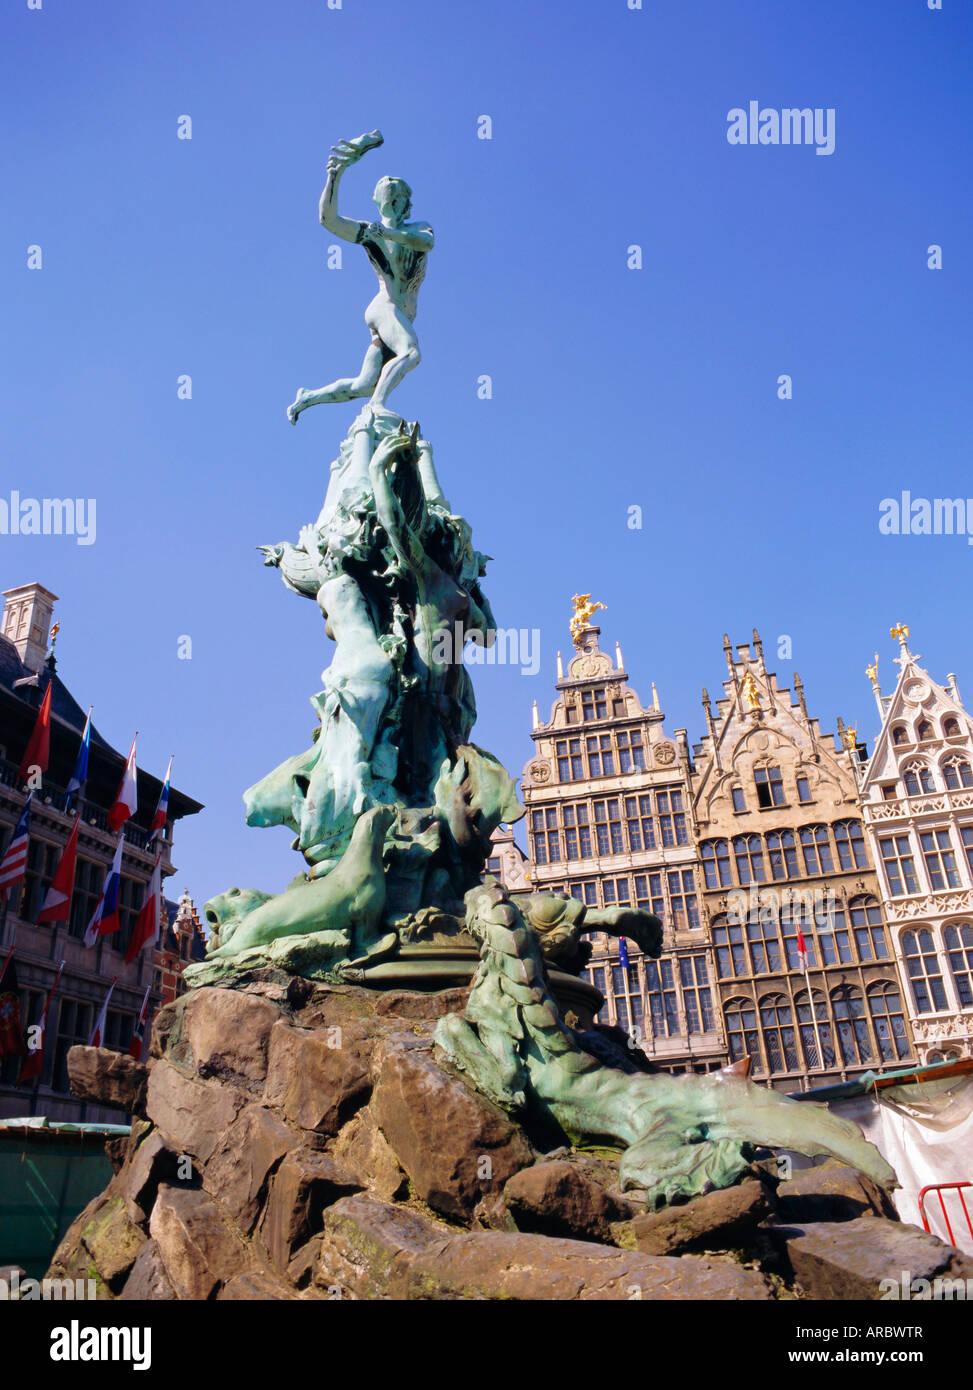 Bronze of Silvius Brabo who flings hand of defeated giant Antigonus into River Scheldt, Grote Markt, Antwerp, Belgium - Stock Image